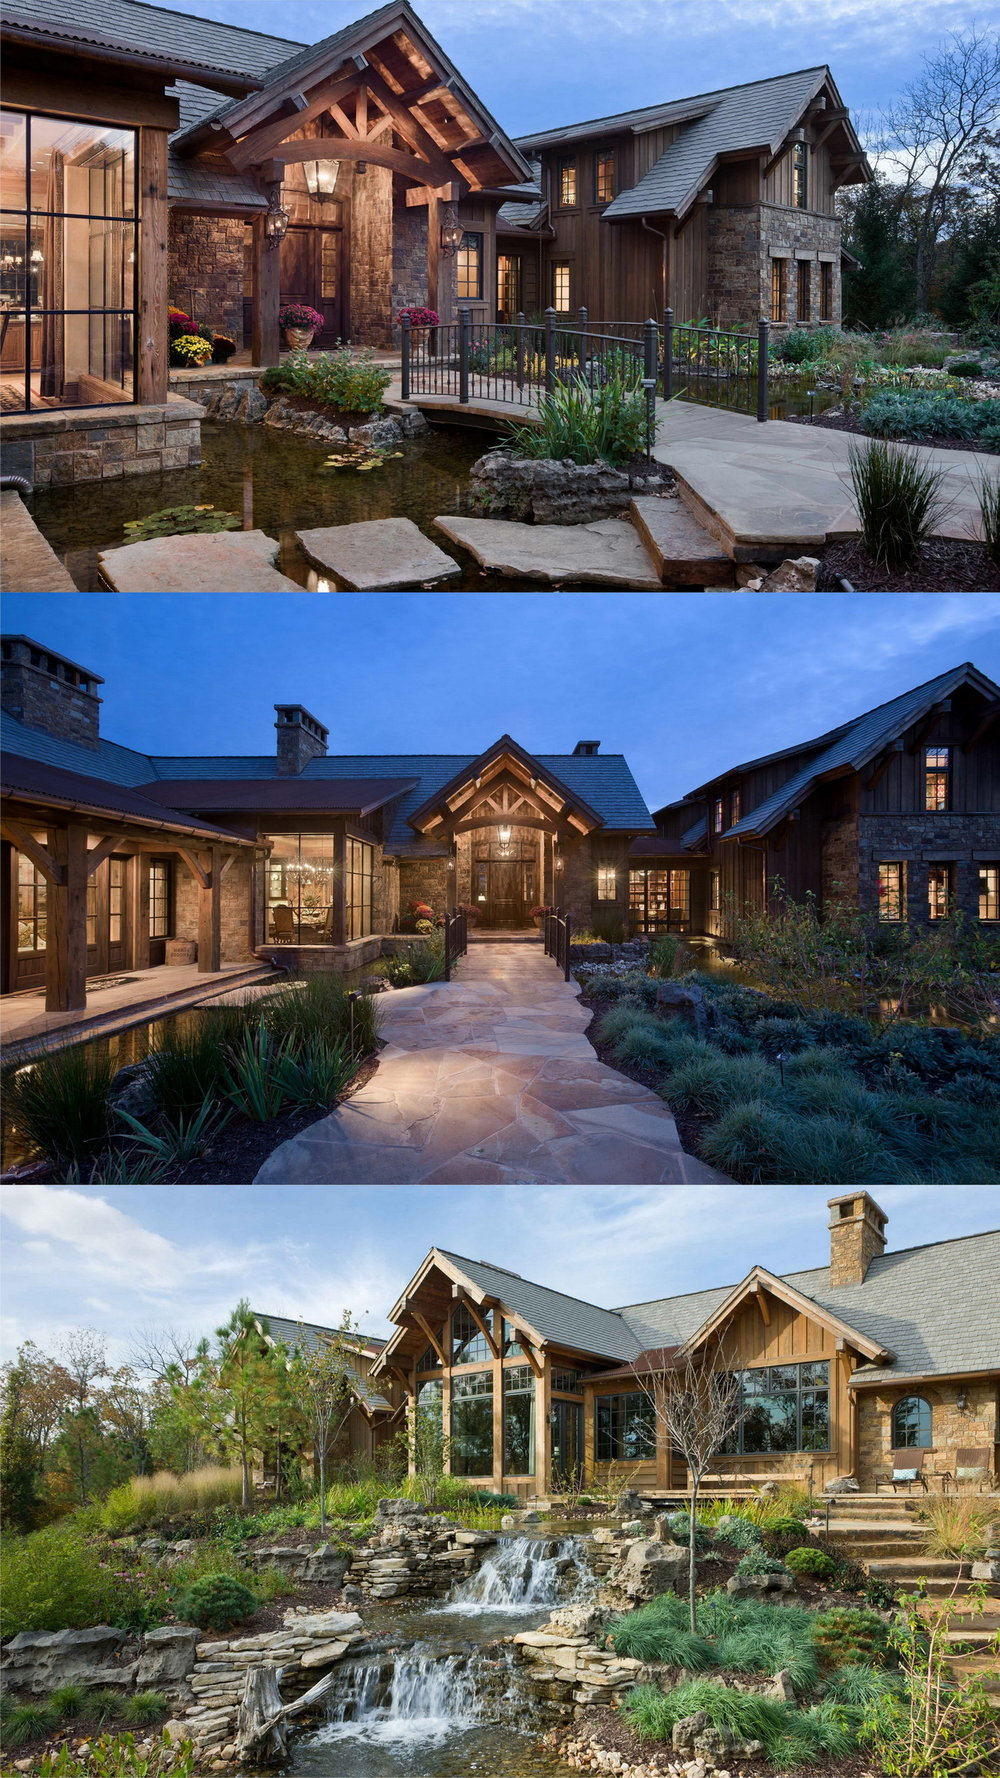 Chimney Rock Residence by Locati Architects